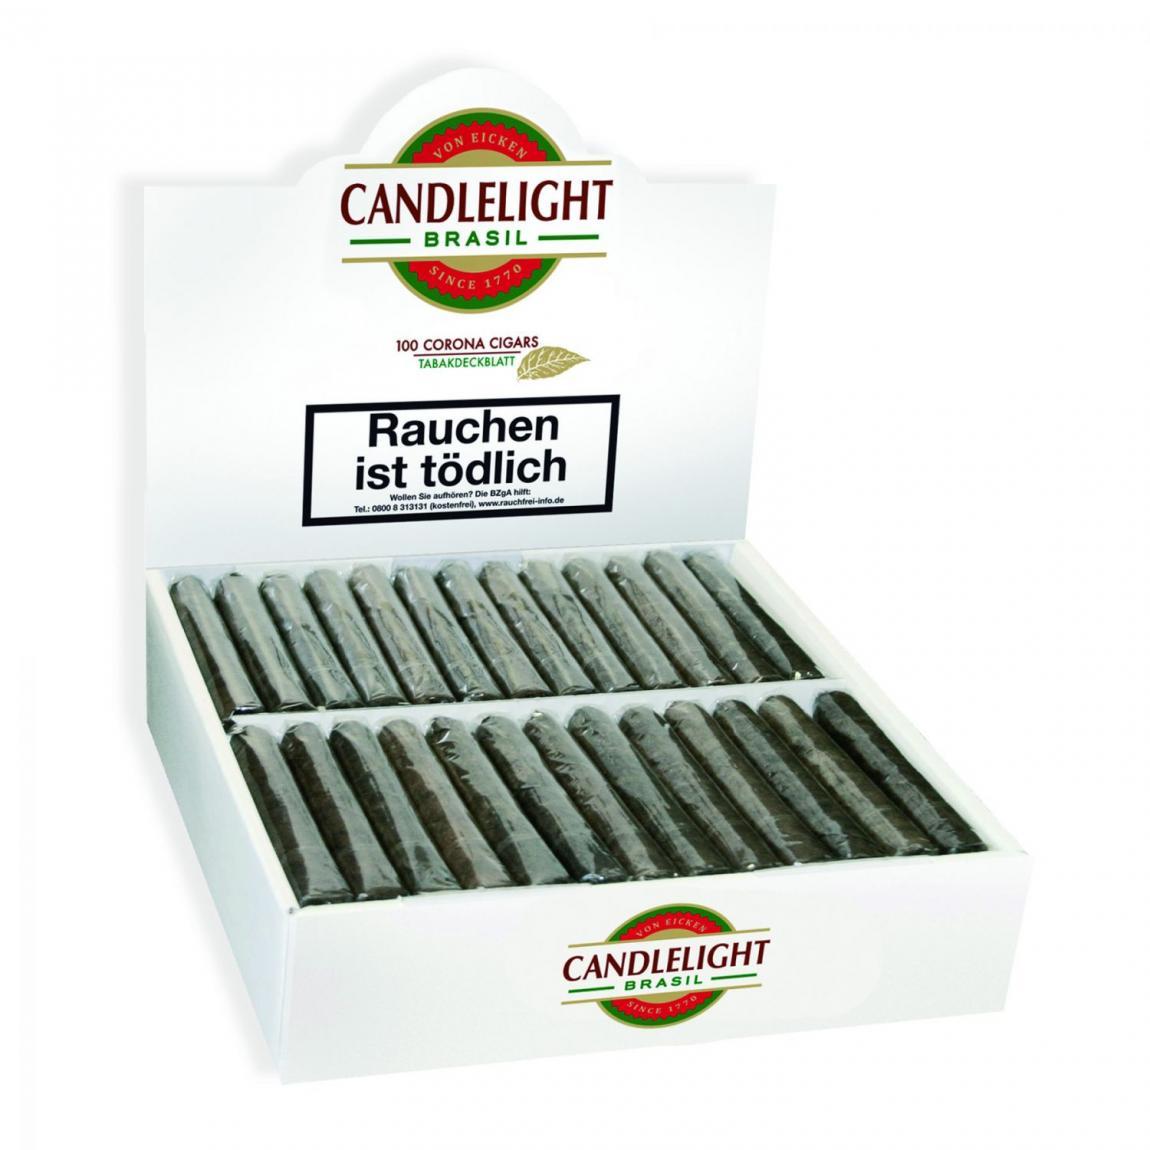 Candlelight Coronas 100 Brasil 100er Karton